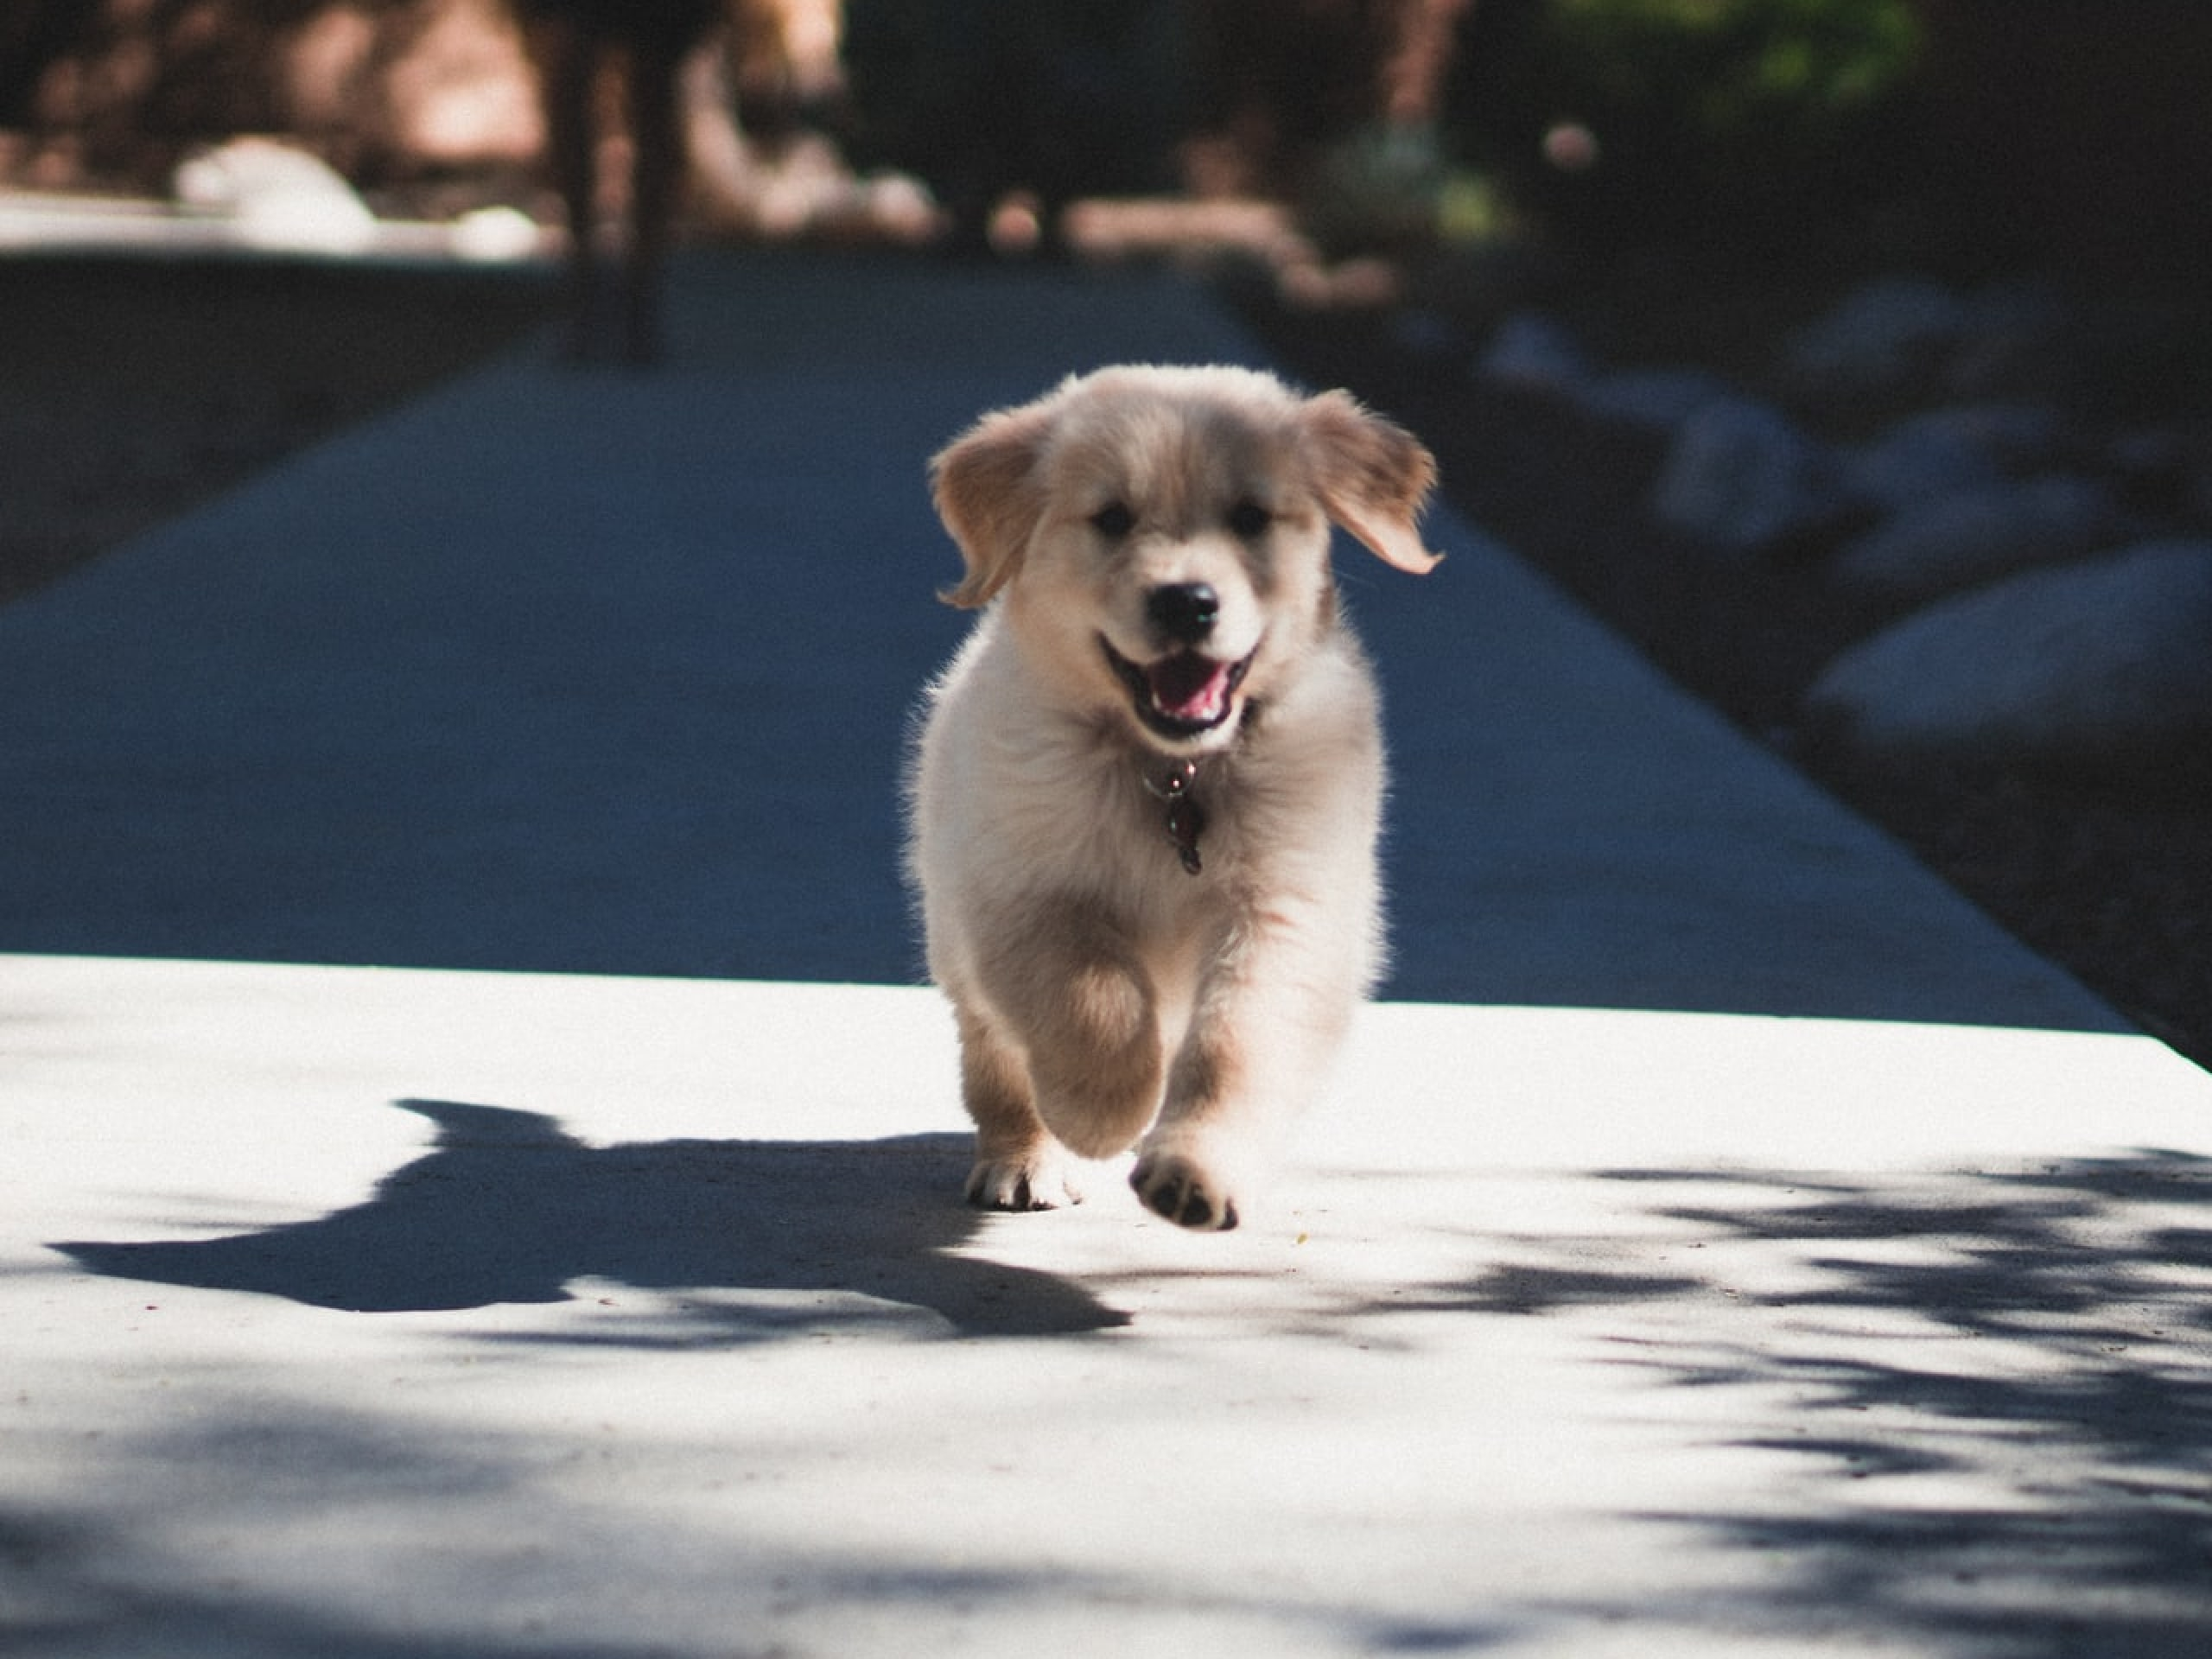 A golden retriever puppy running towards the camera